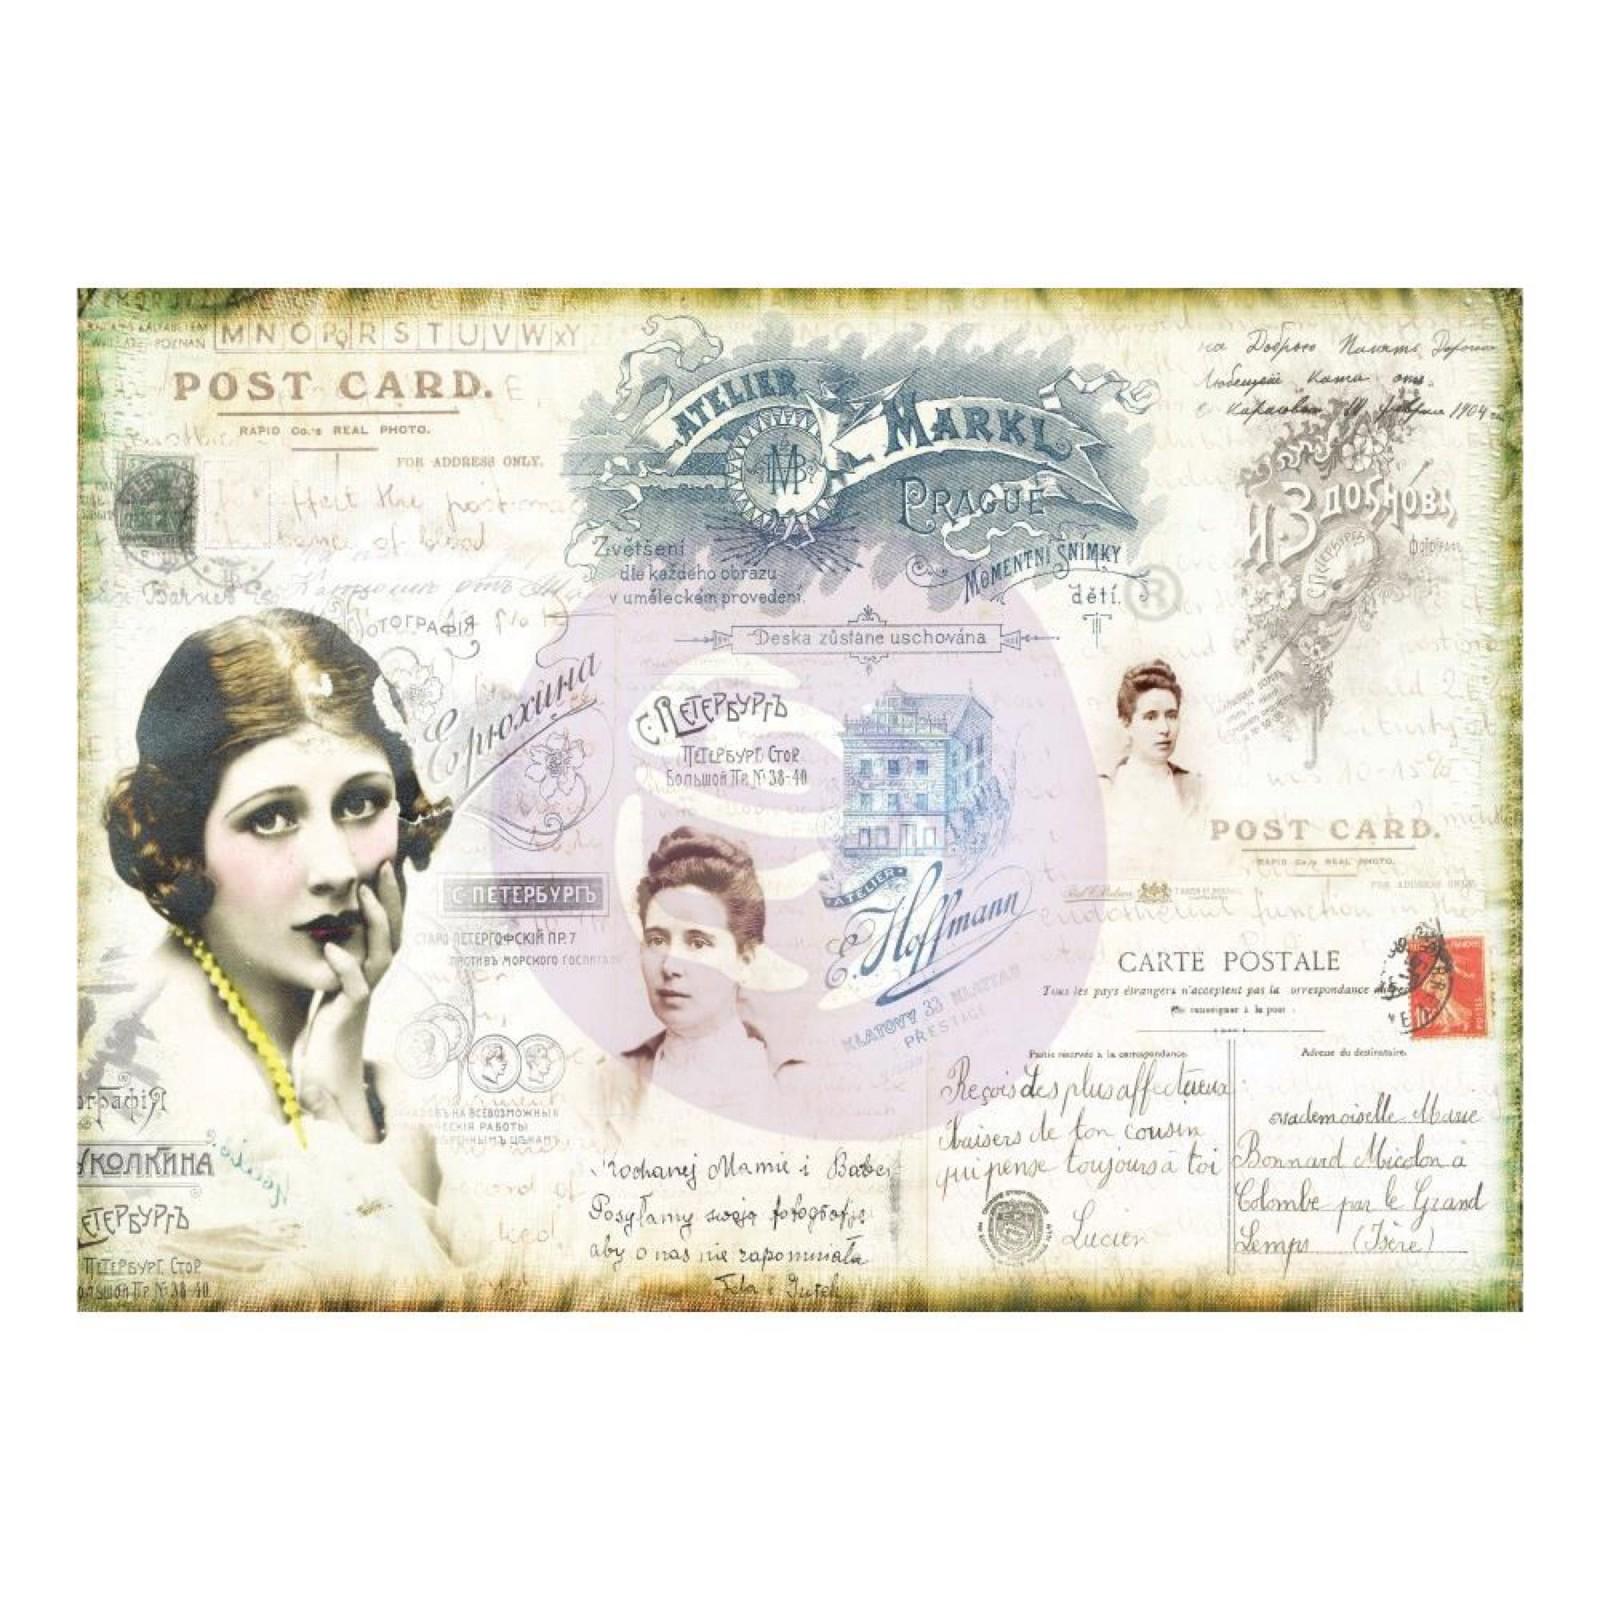 Decoration Carte Postale.Finnabair Decorative Tissue Paper Carte Postale Dairy Hill Vintage Shop